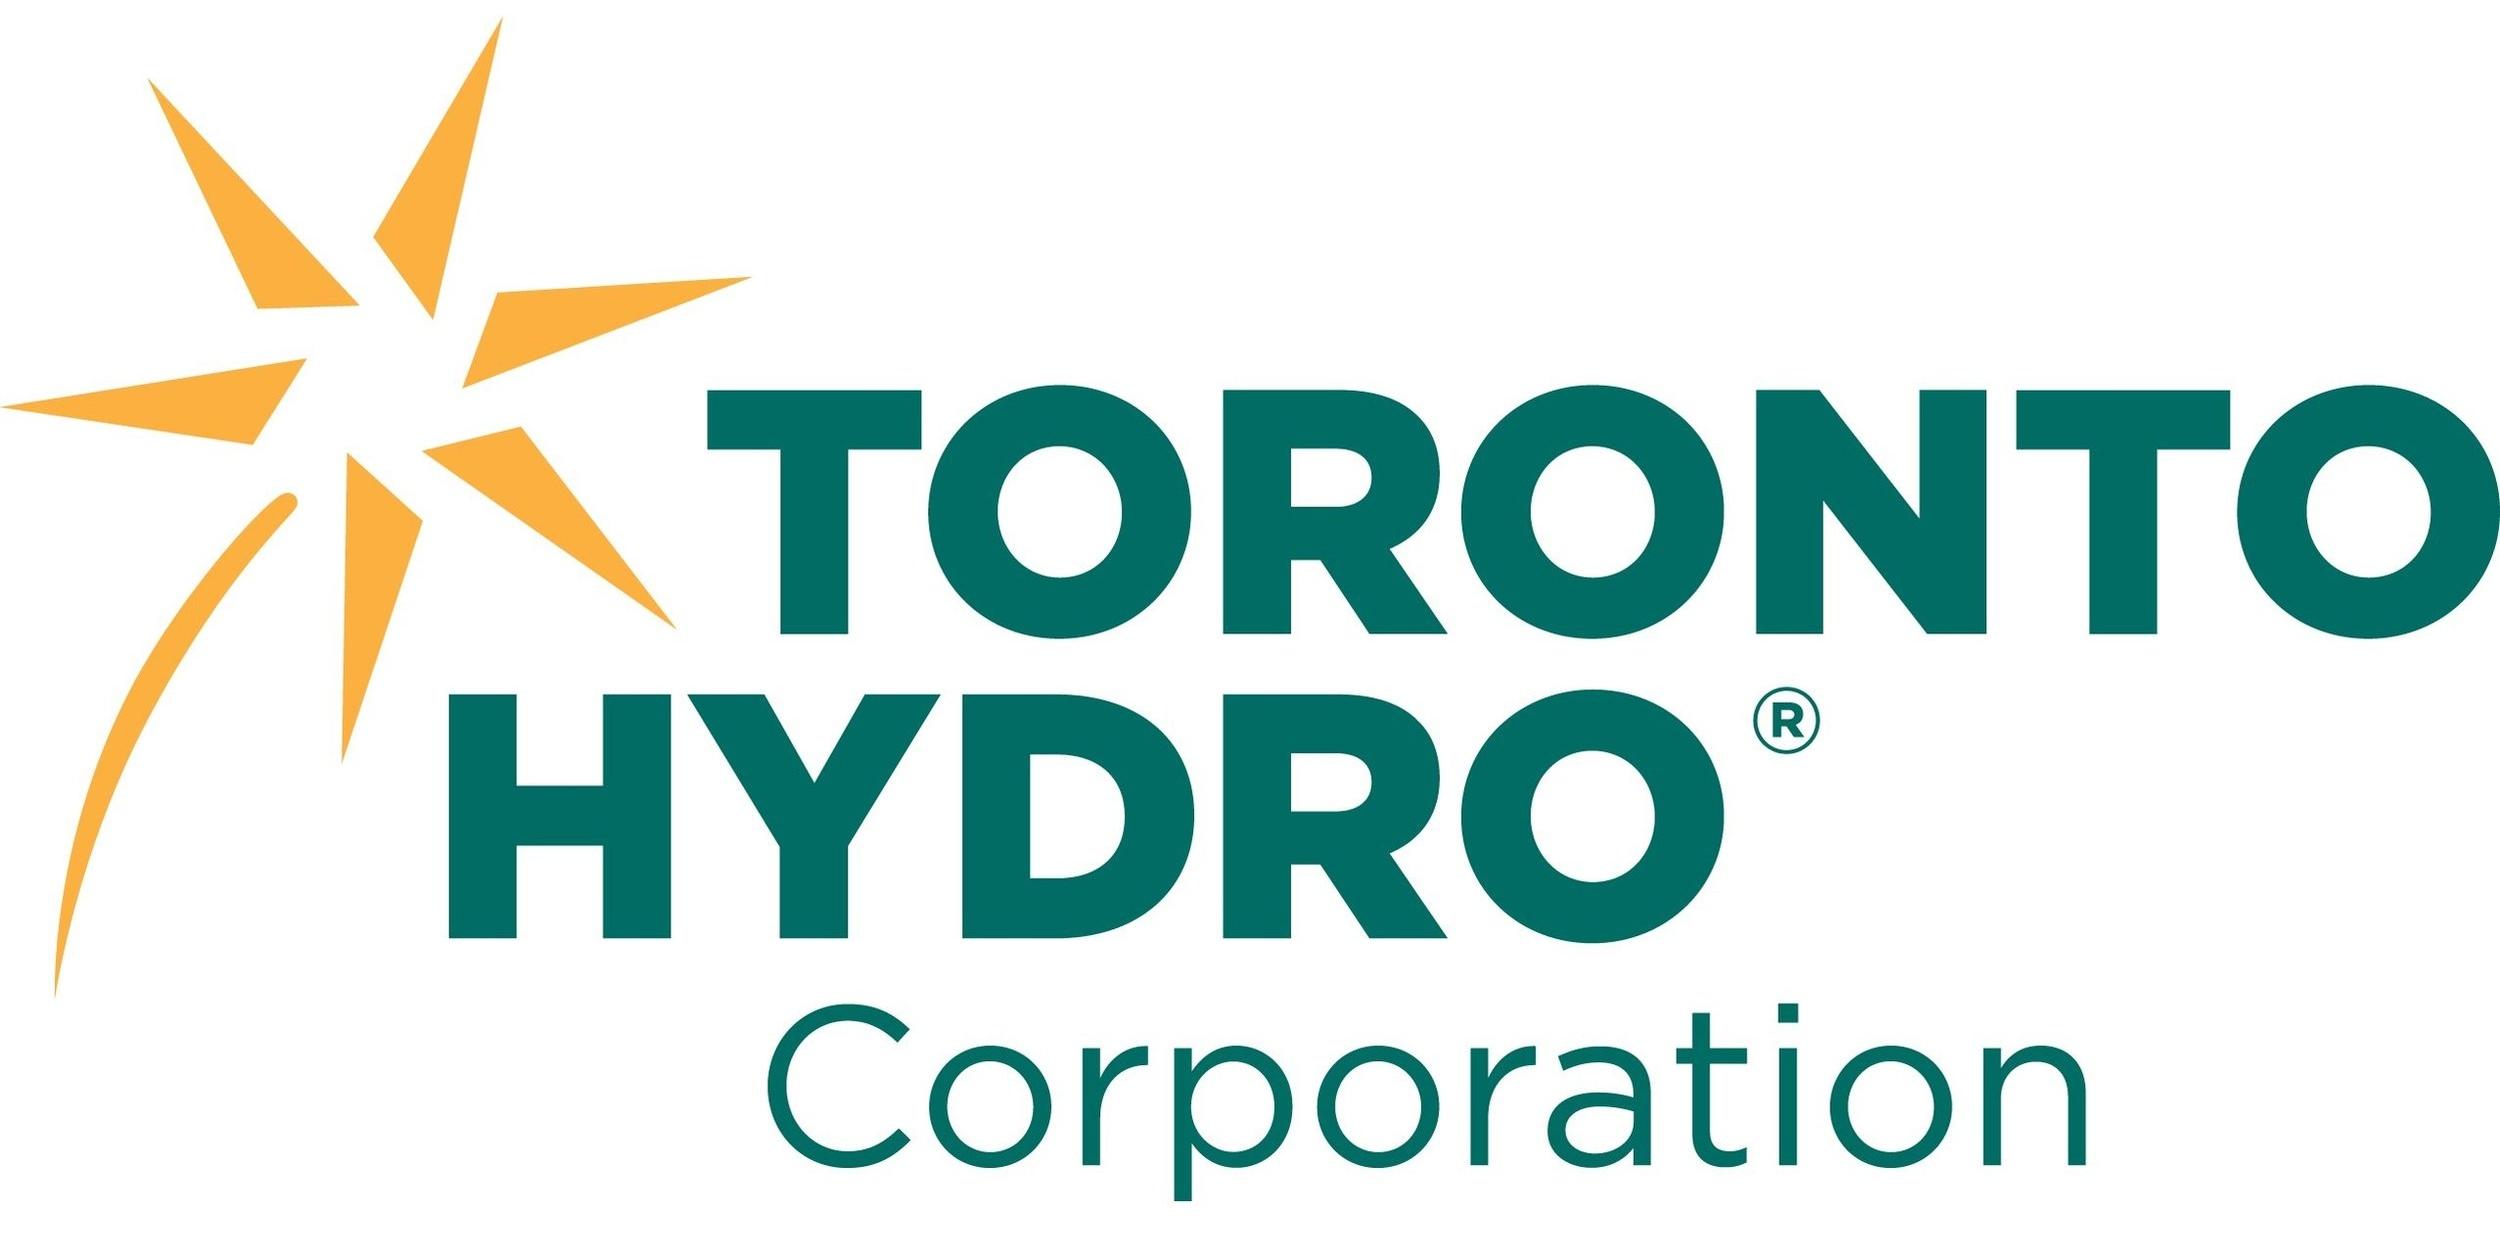 Toronto Hydro